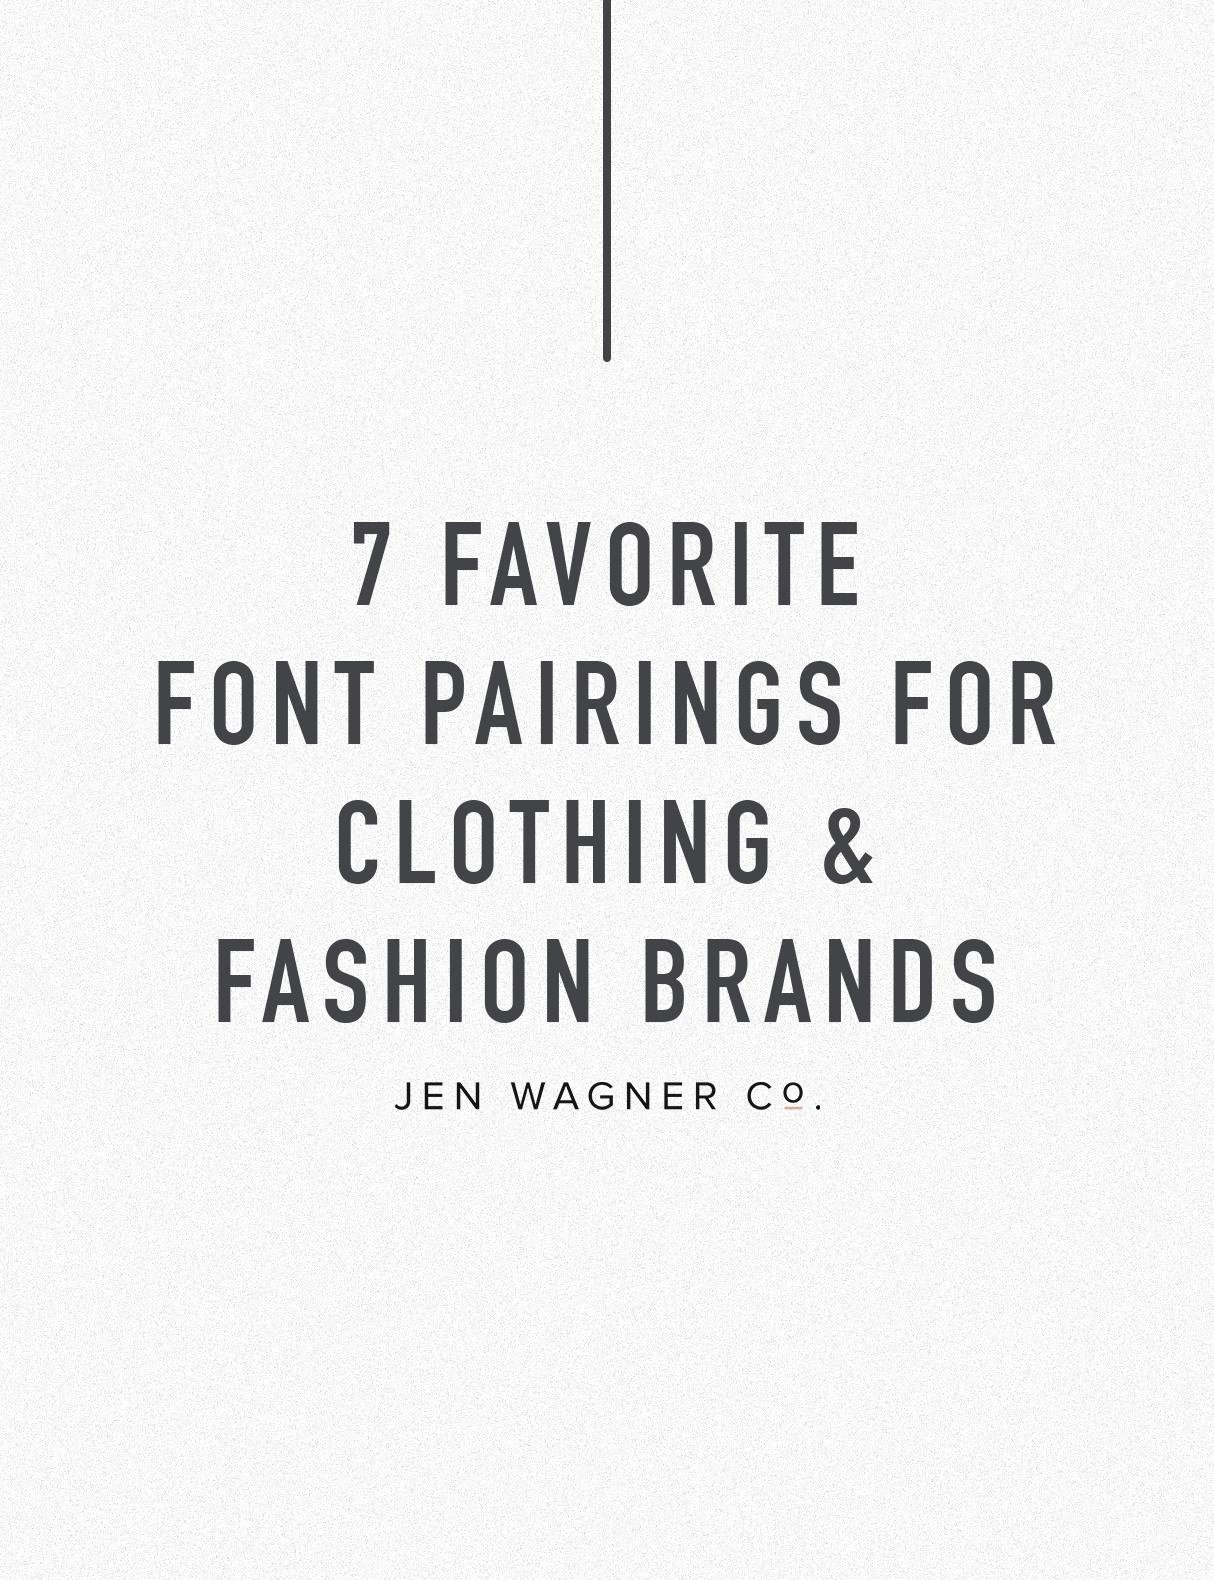 Jen Wagner Co Fashion Brand Font Pairings